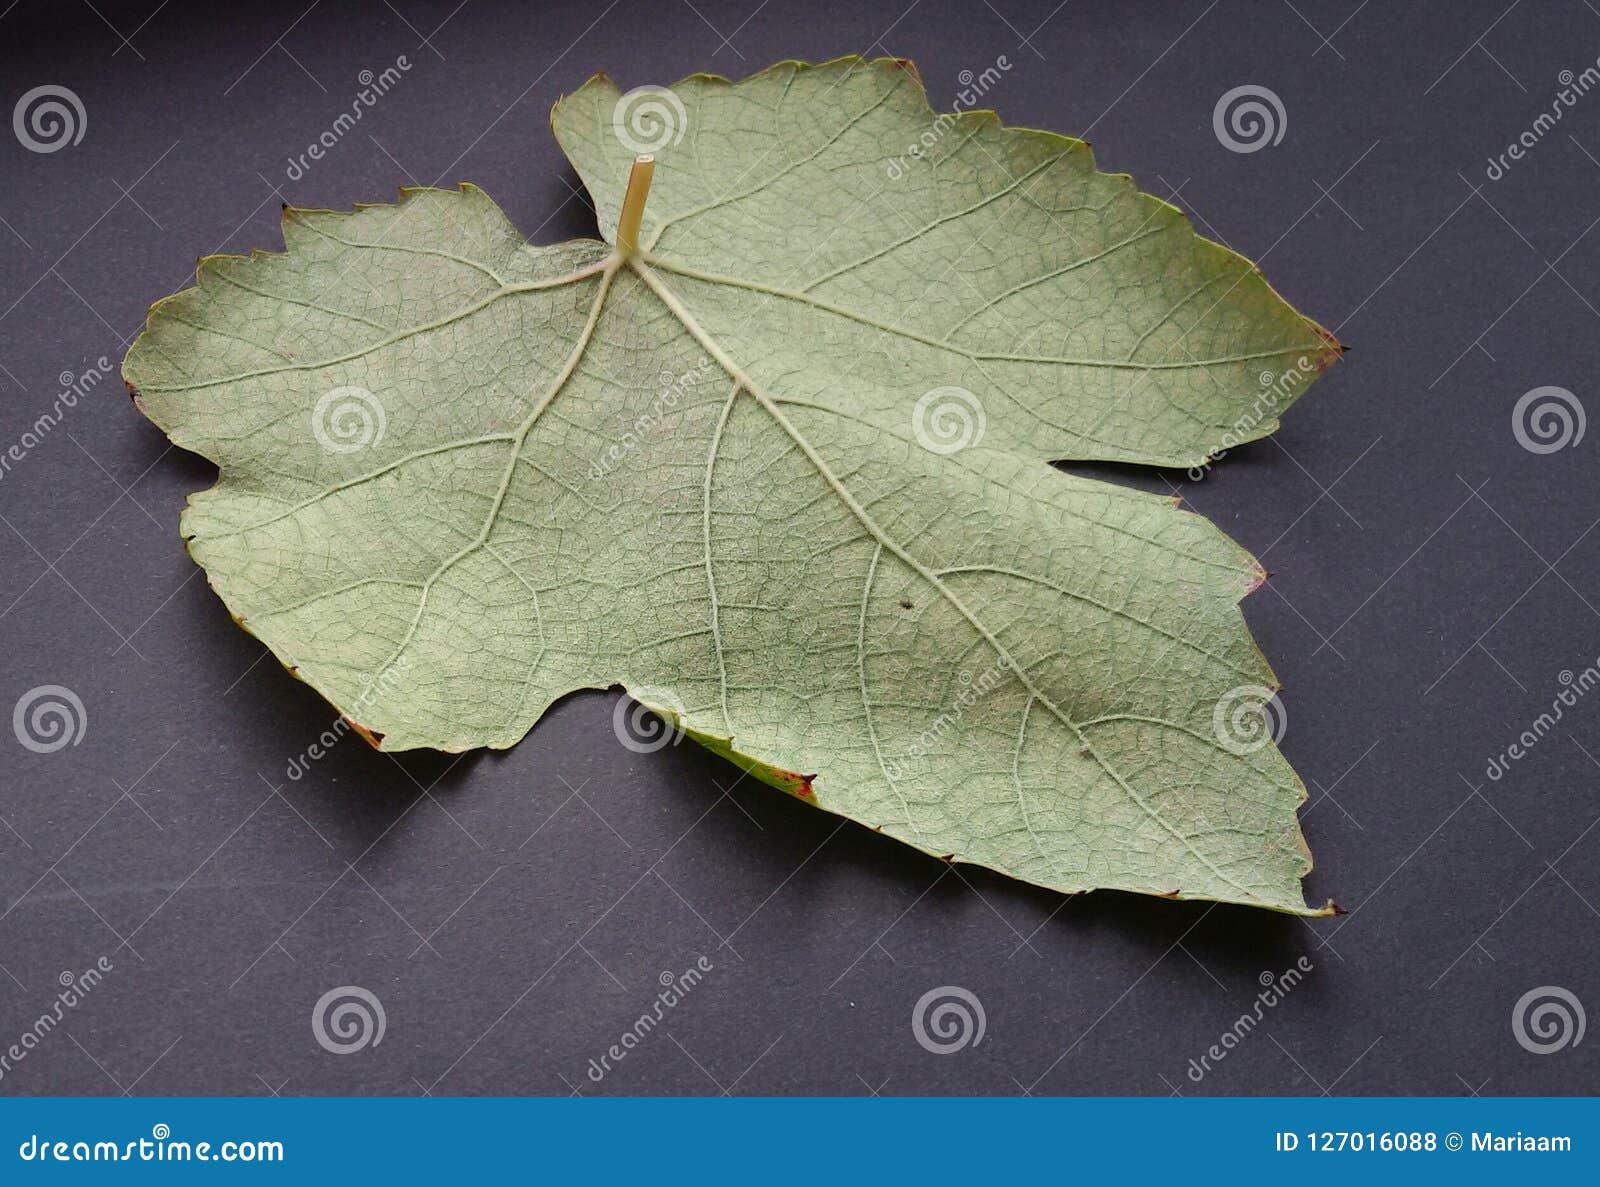 Structure of wine leaf over dark background.